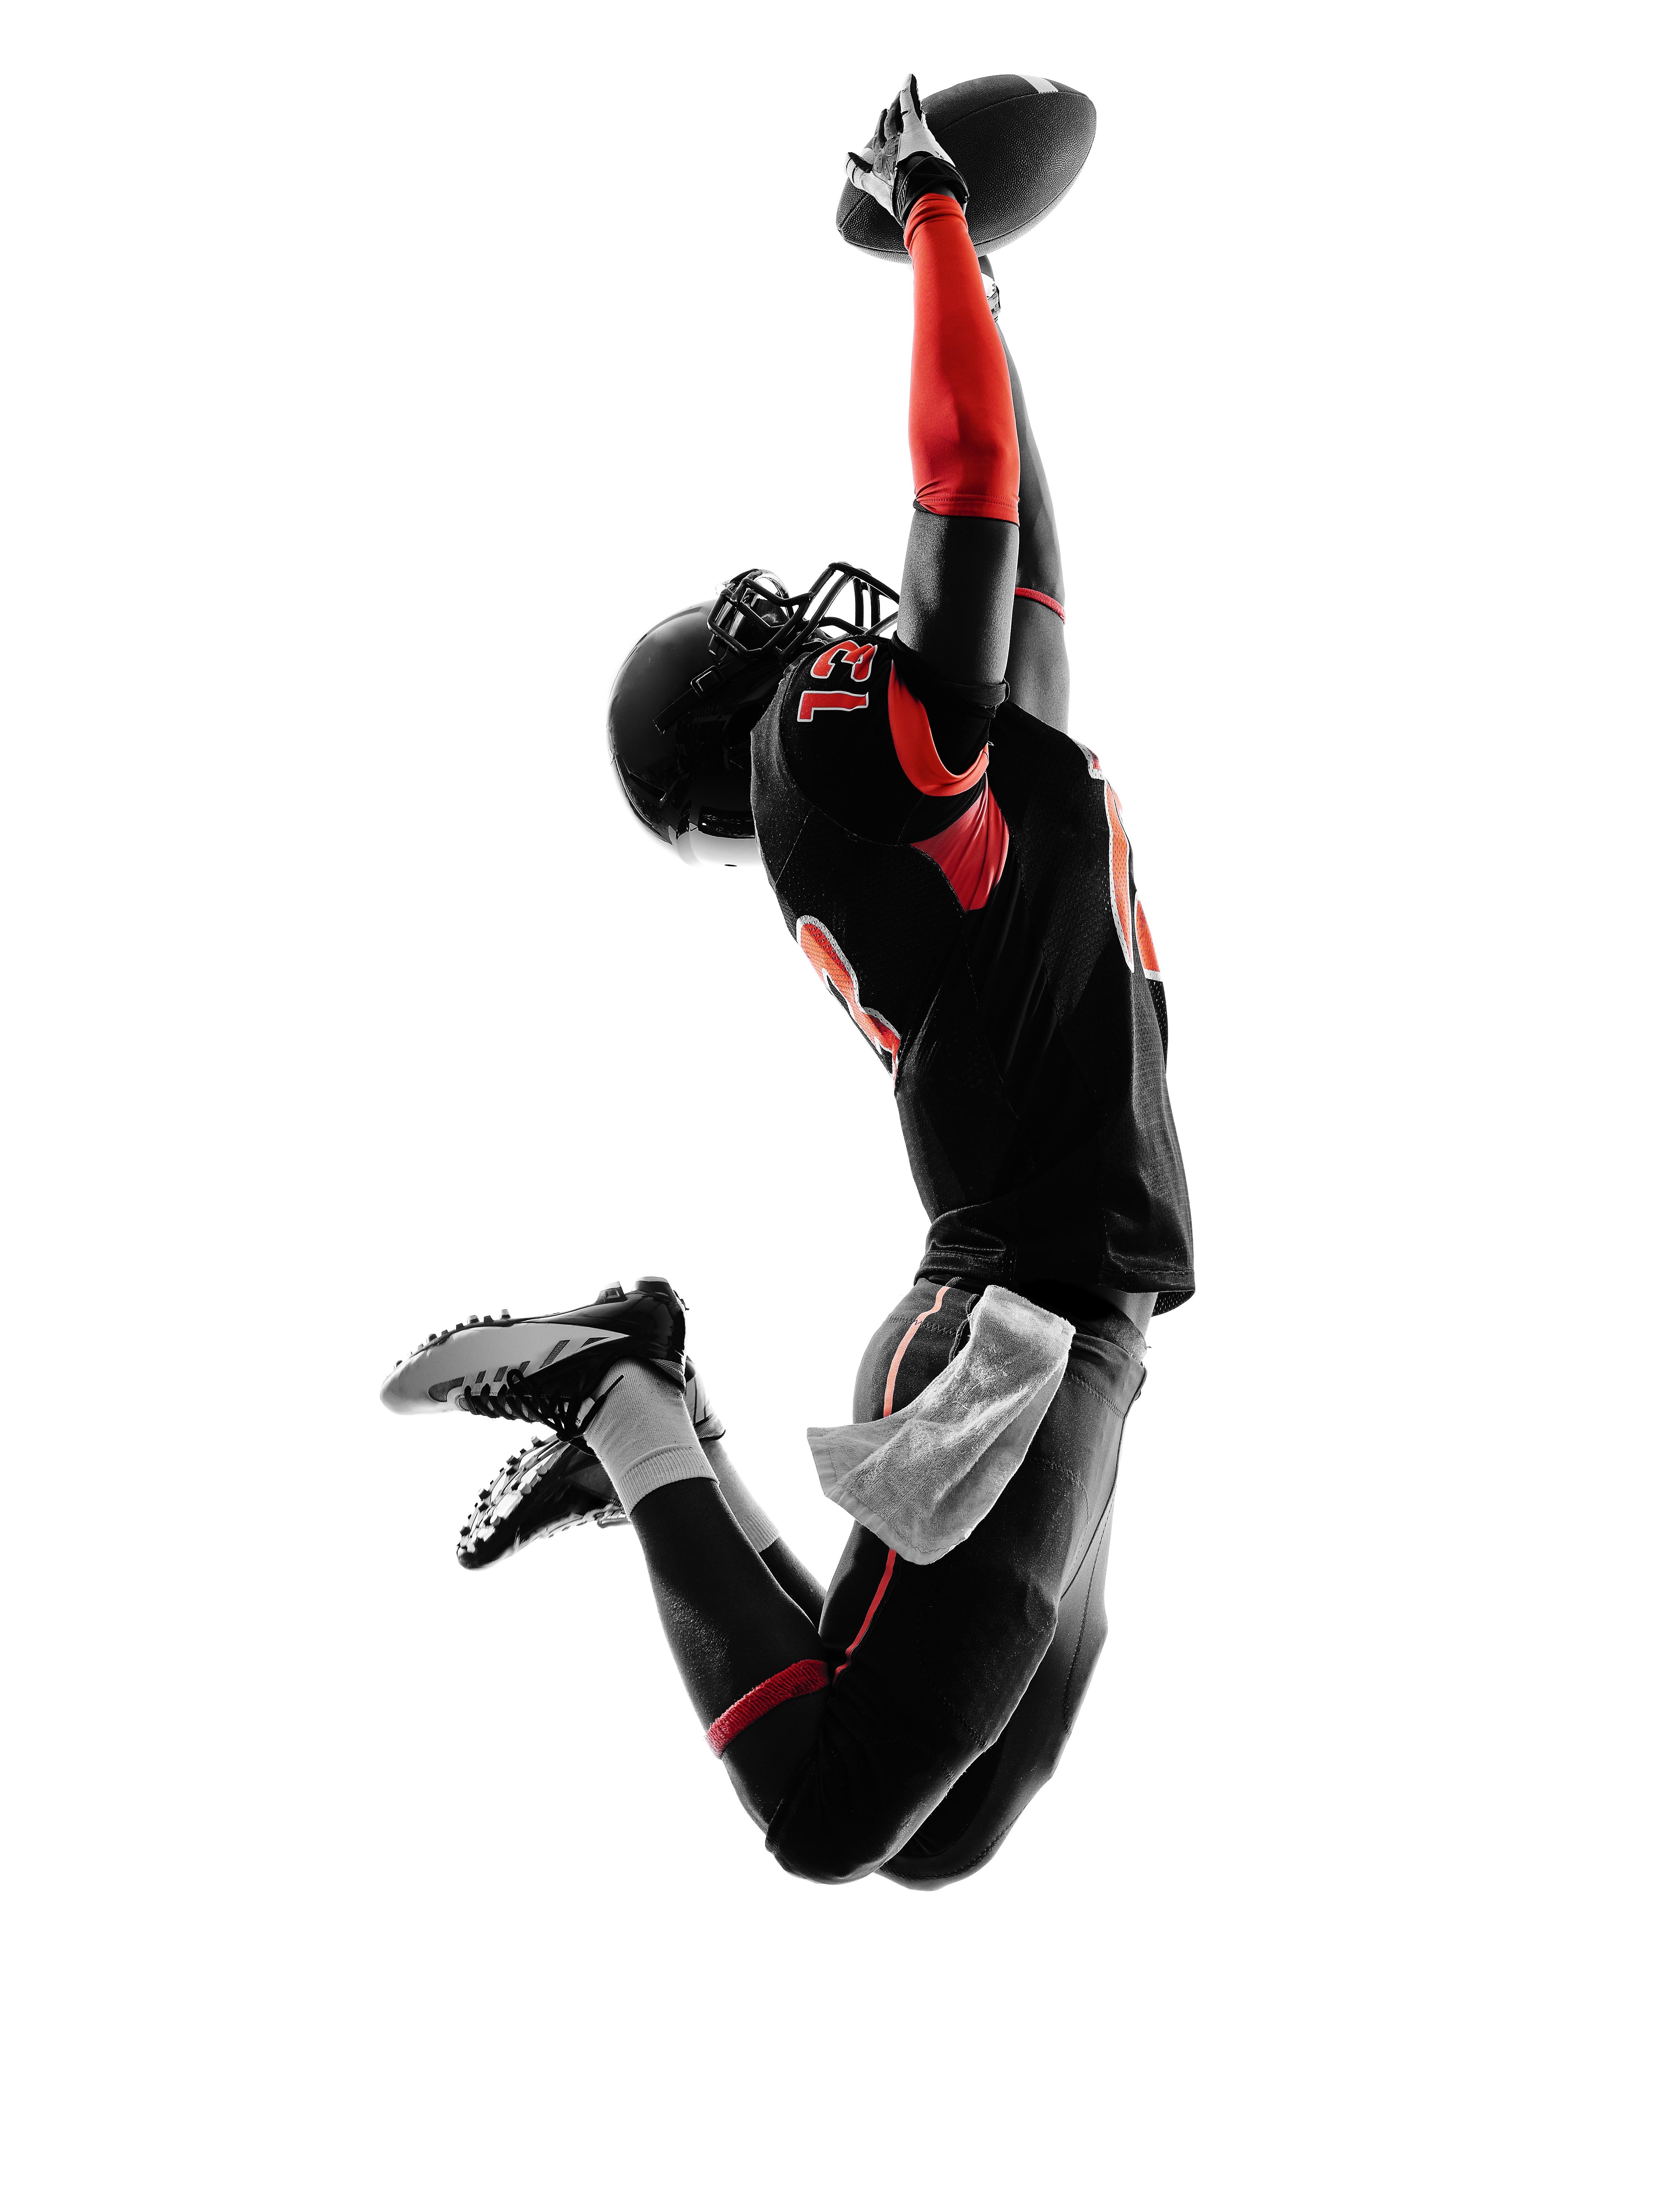 NFL Warmup Routine Muscle Activation Technique